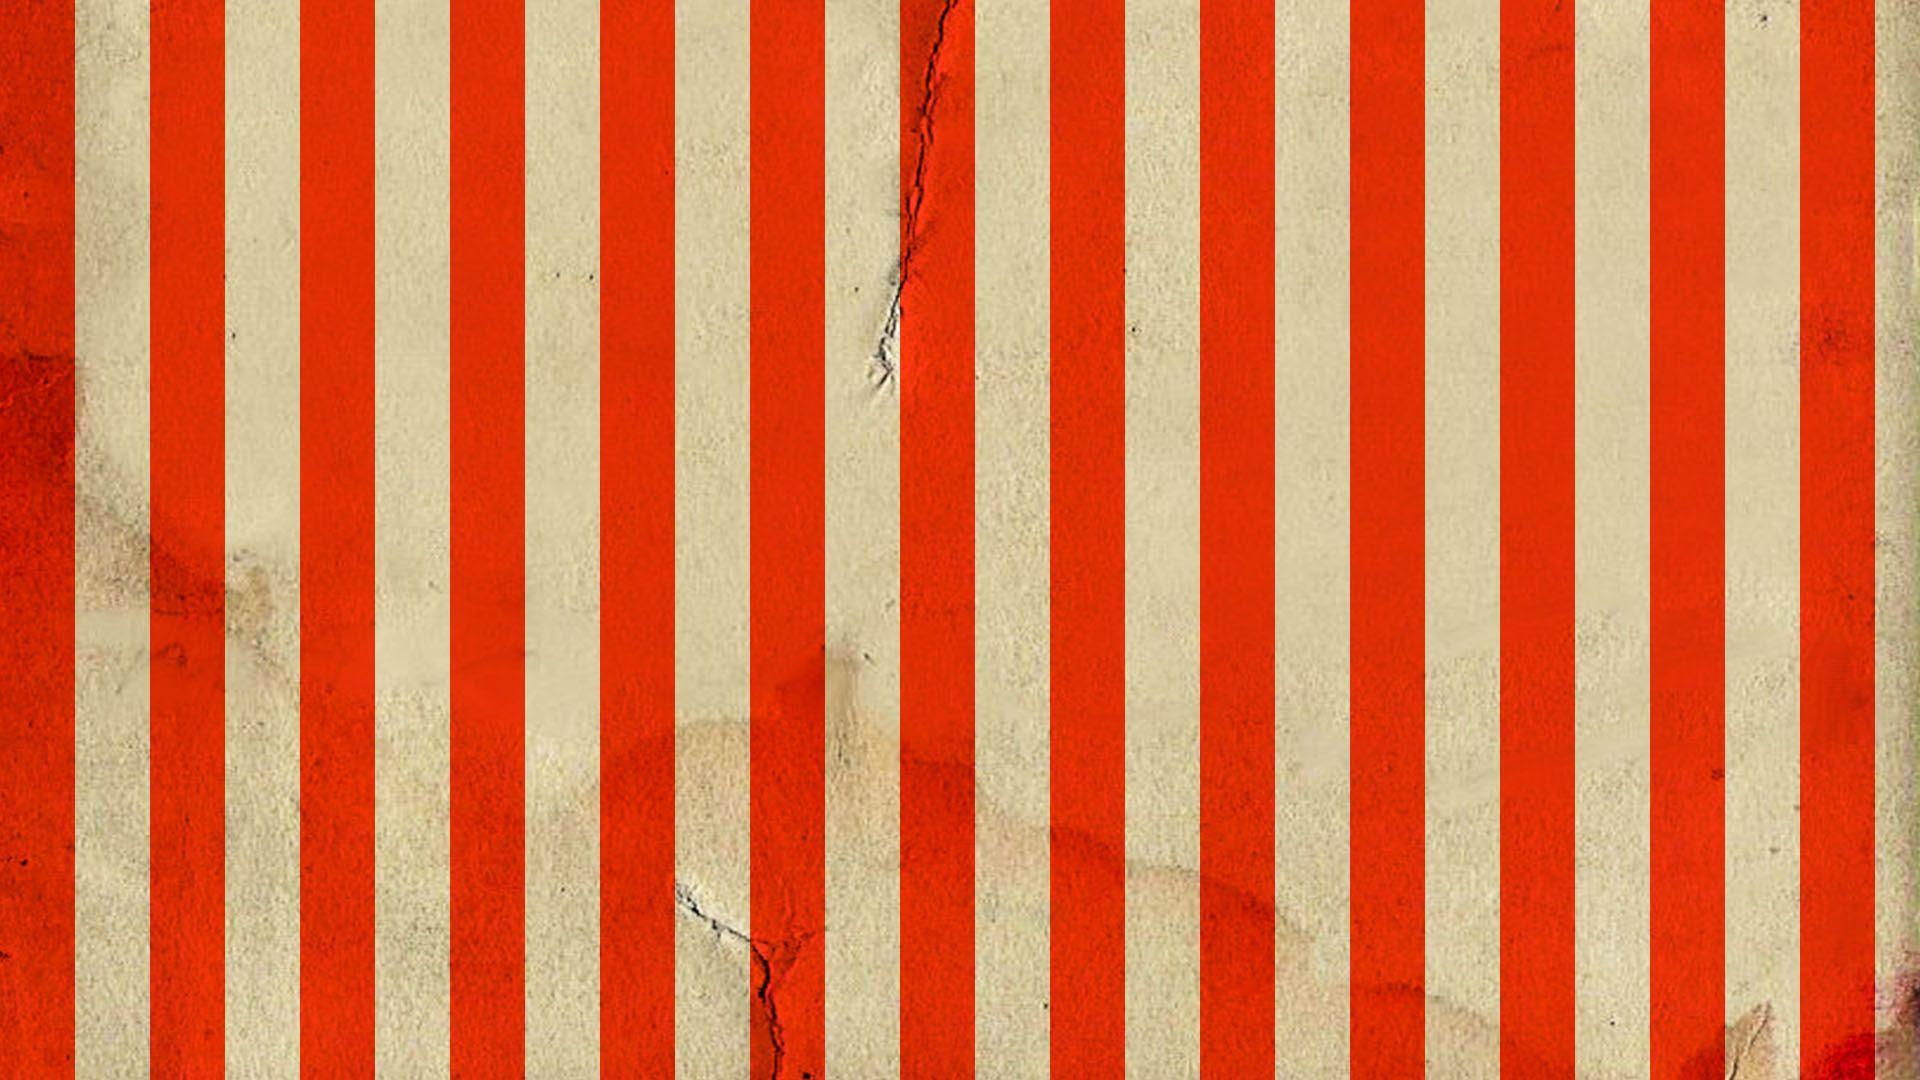 Free Animated Fall Wallpaper Circus Wallpapers Hd Pixelstalk Net